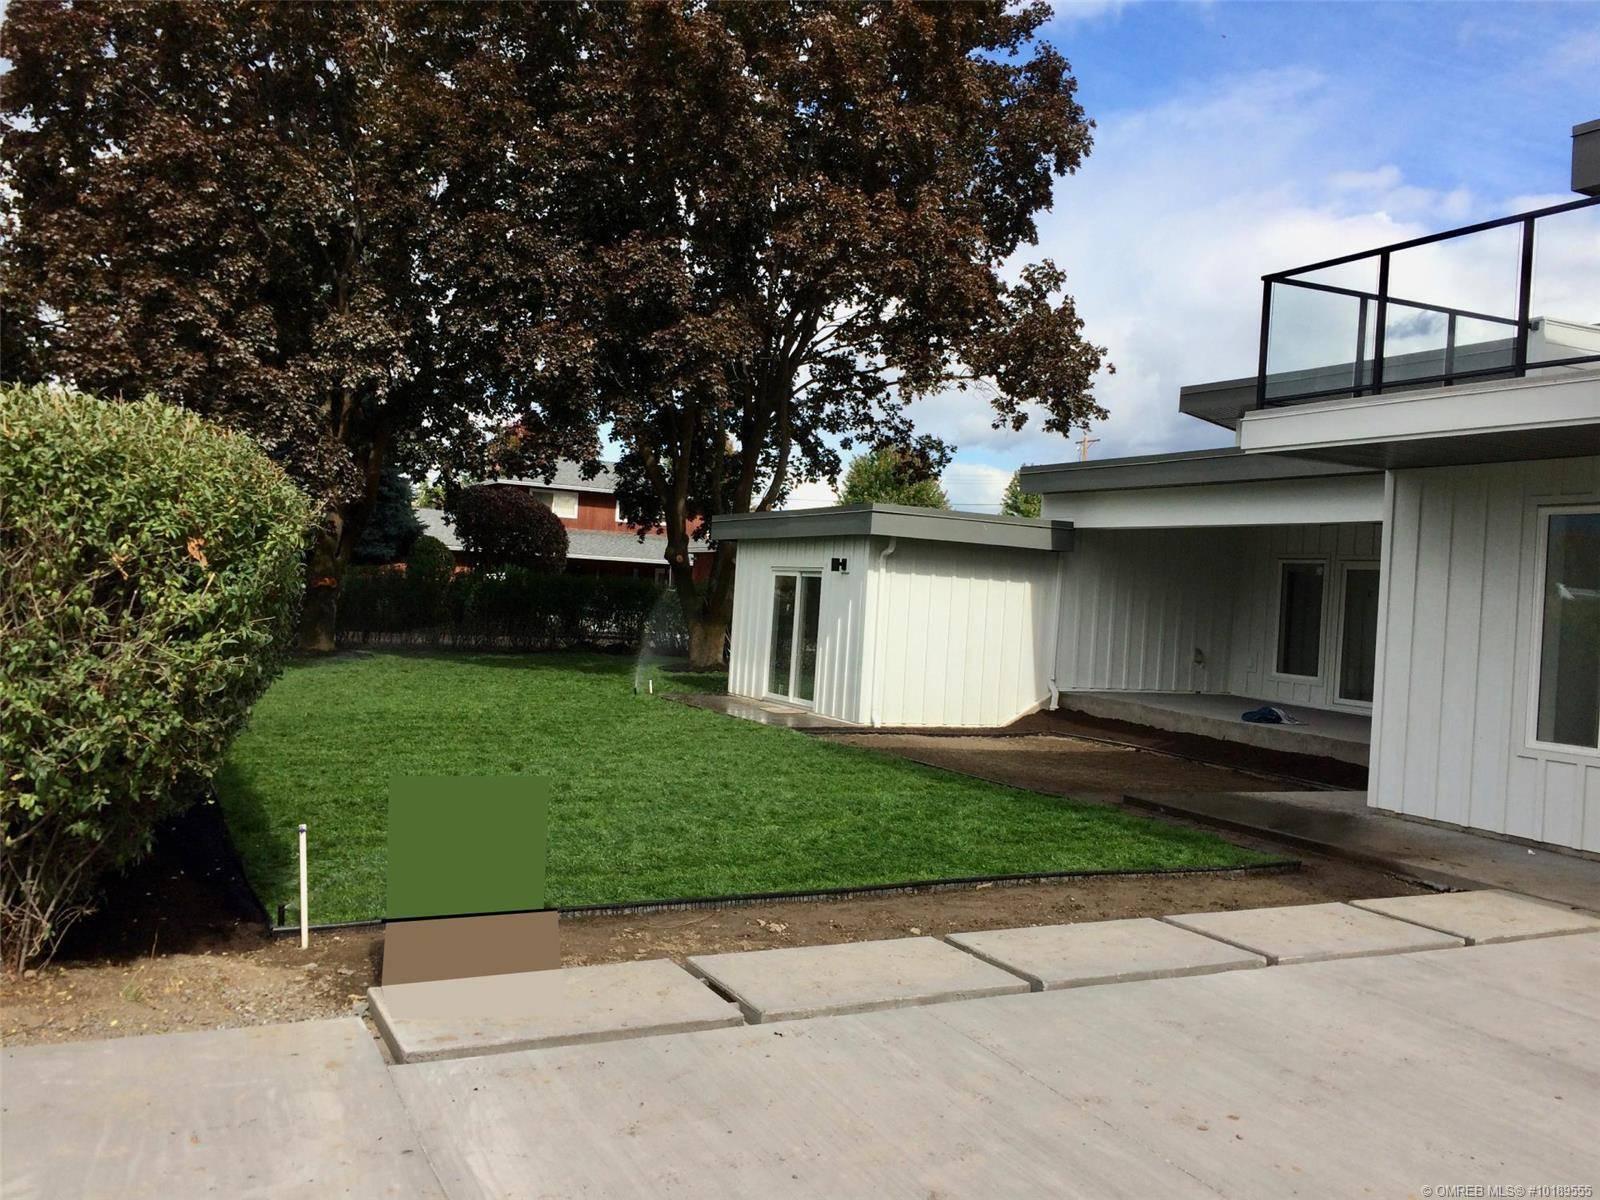 House for sale at 2309 Charolais Rd Kelowna British Columbia - MLS: 10189555